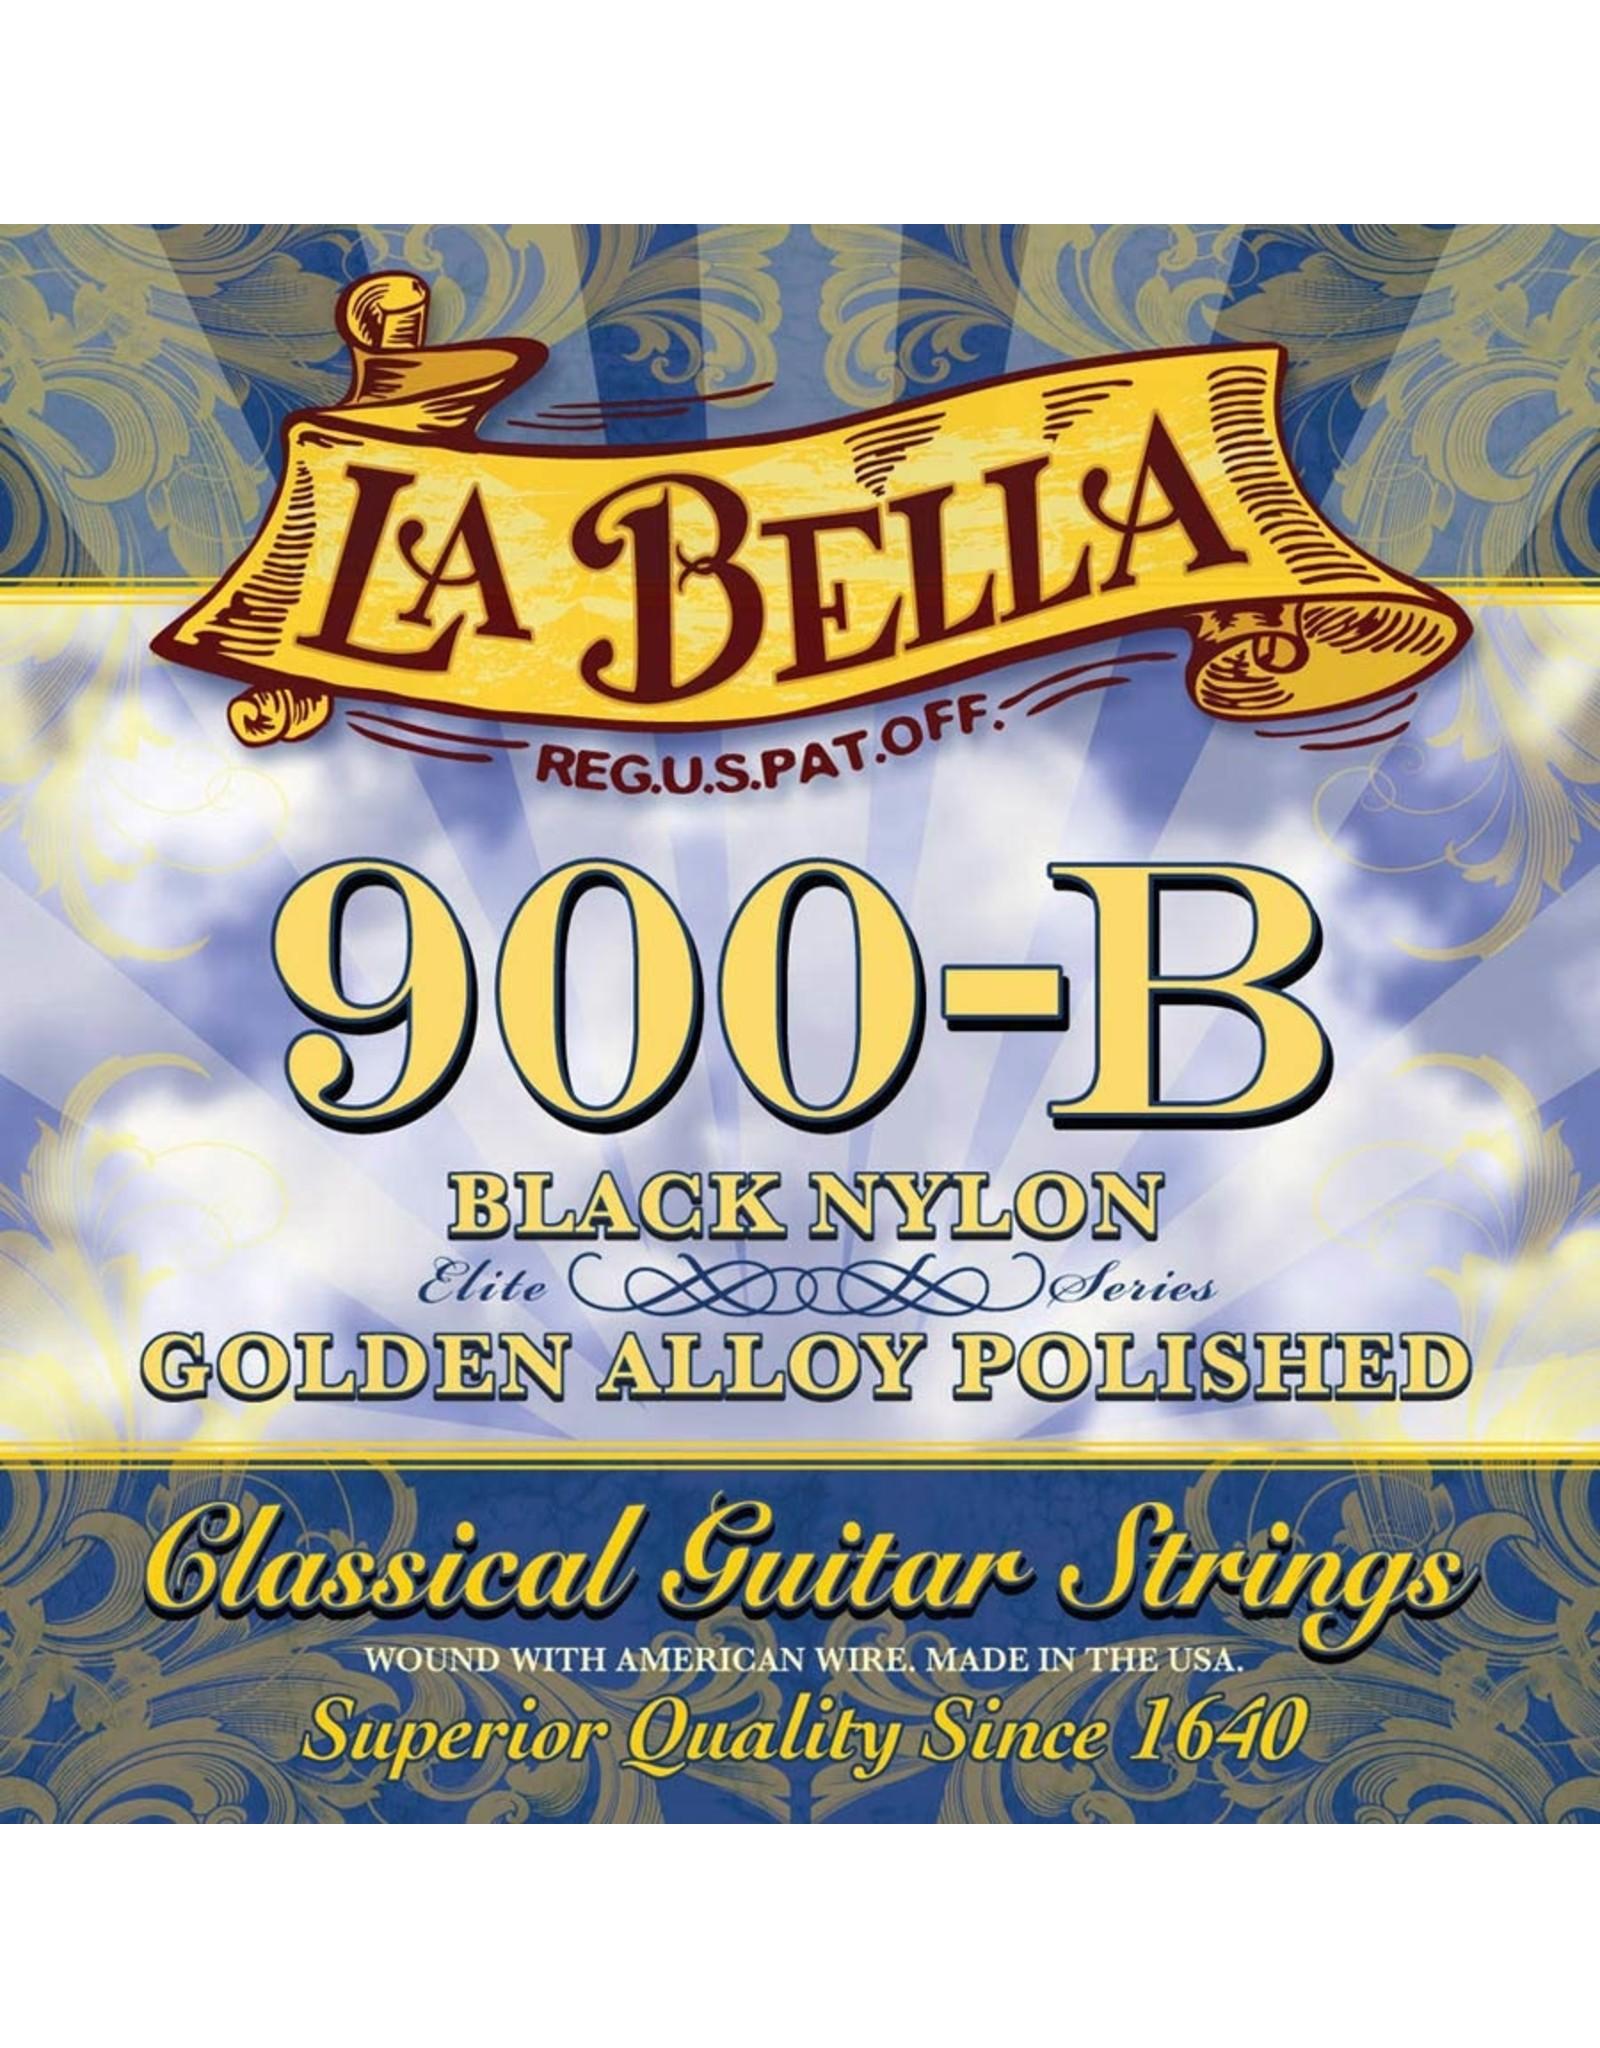 La Bella La Bella 900-B Klassieke Snaren